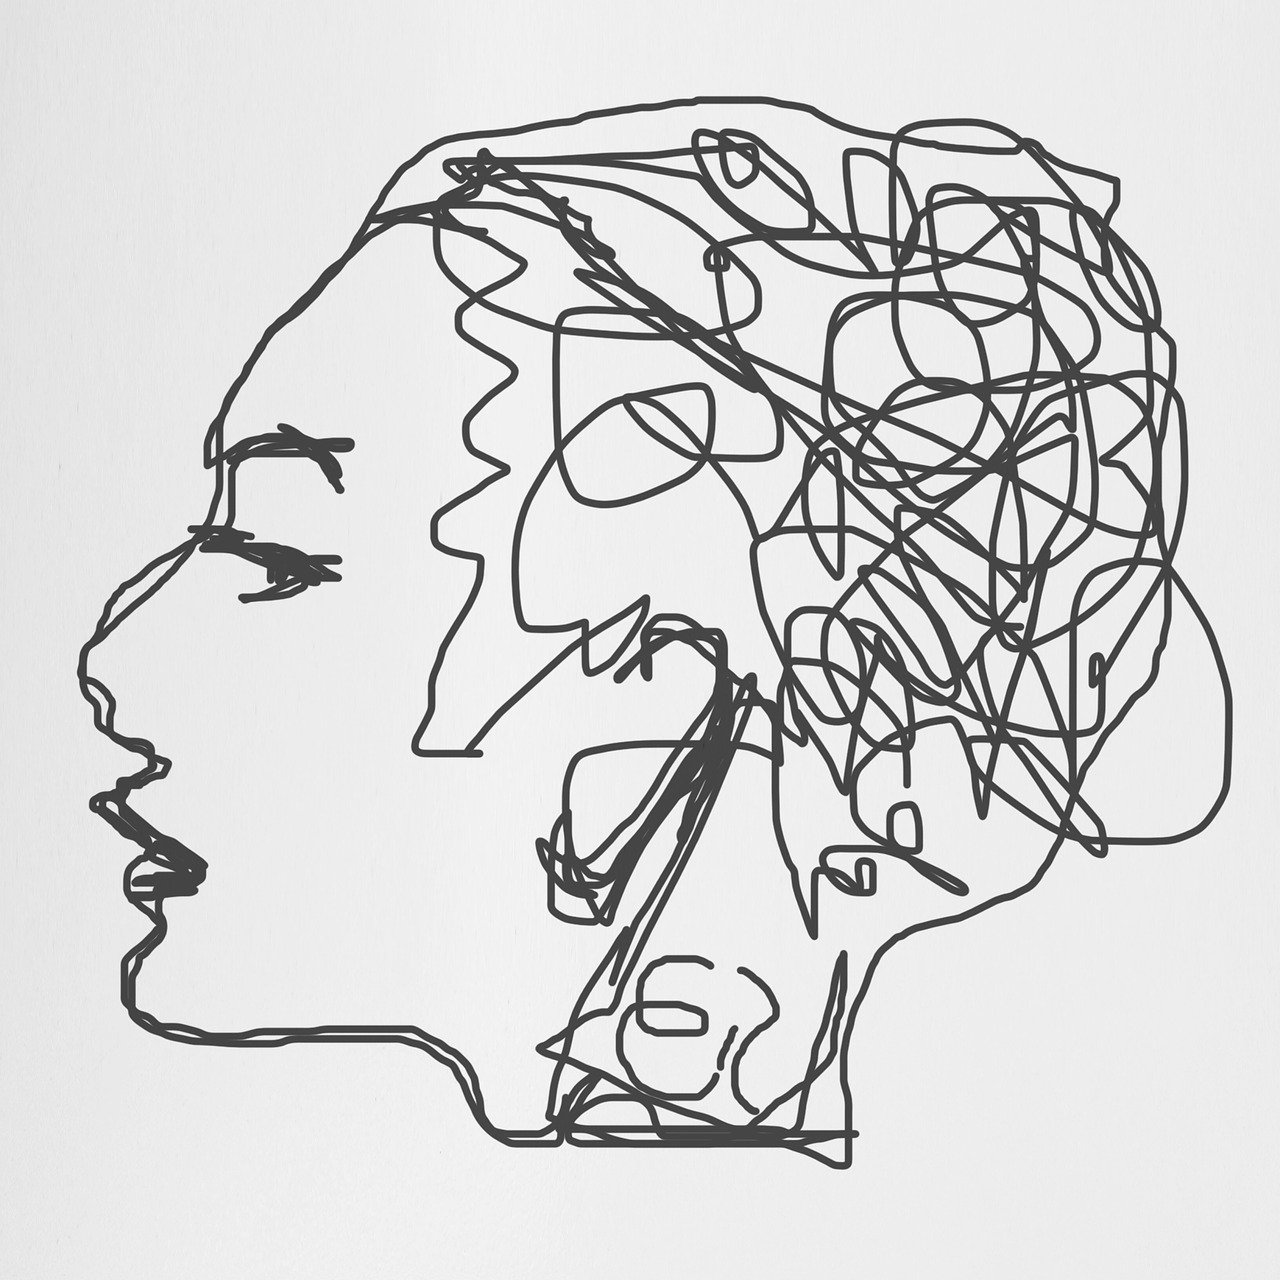 psychology-2422439_1280.jpg